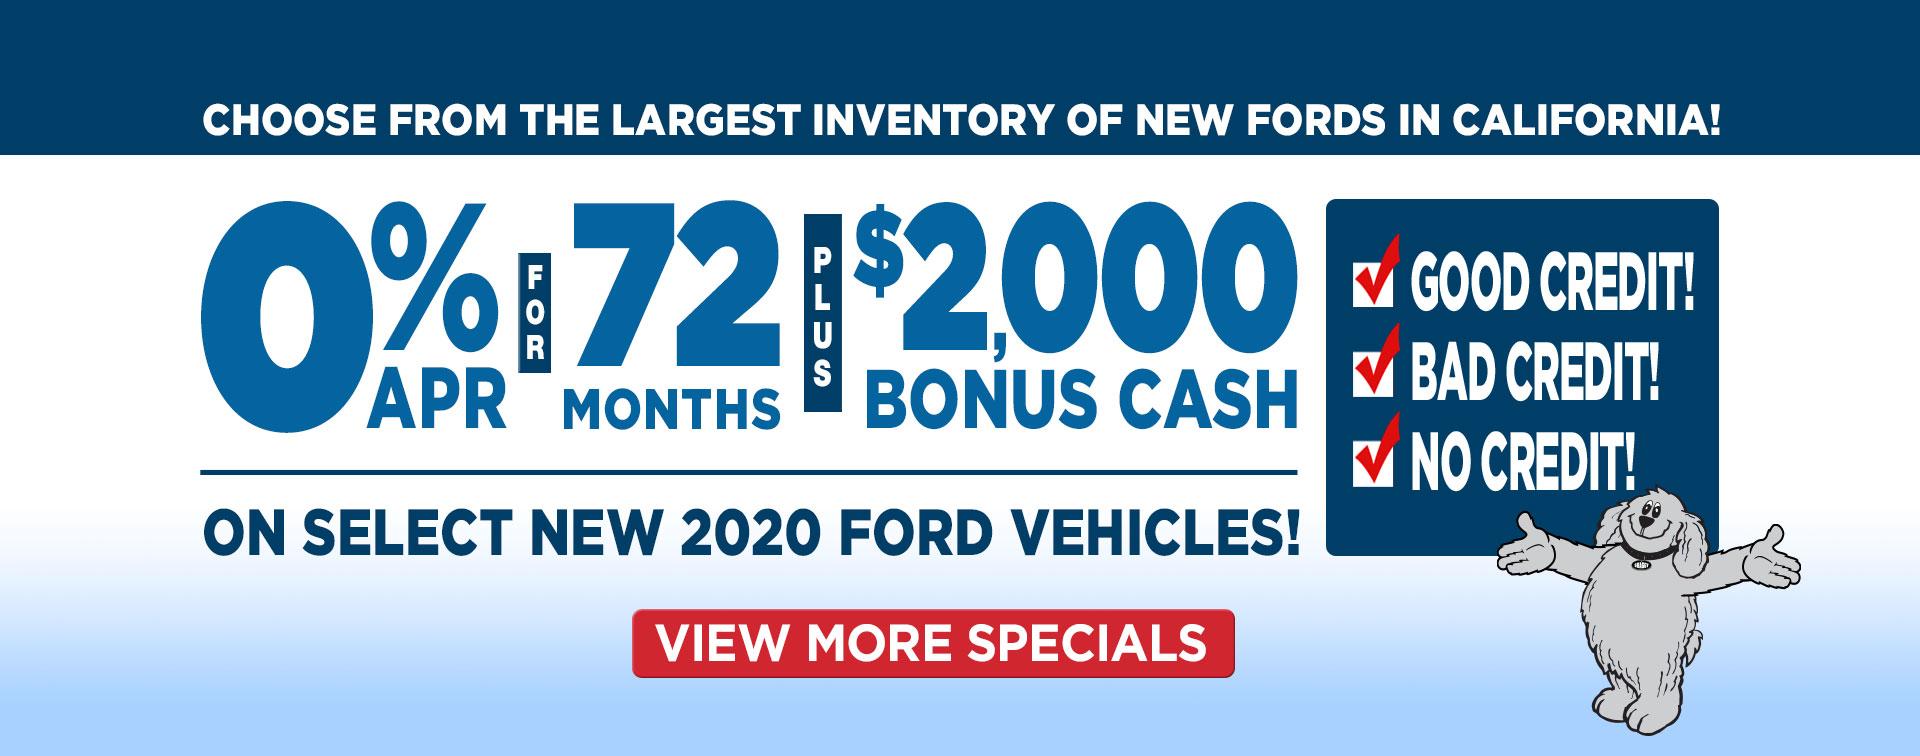 Ford Apr21 0arr Leader 1920x756 C4 (1)